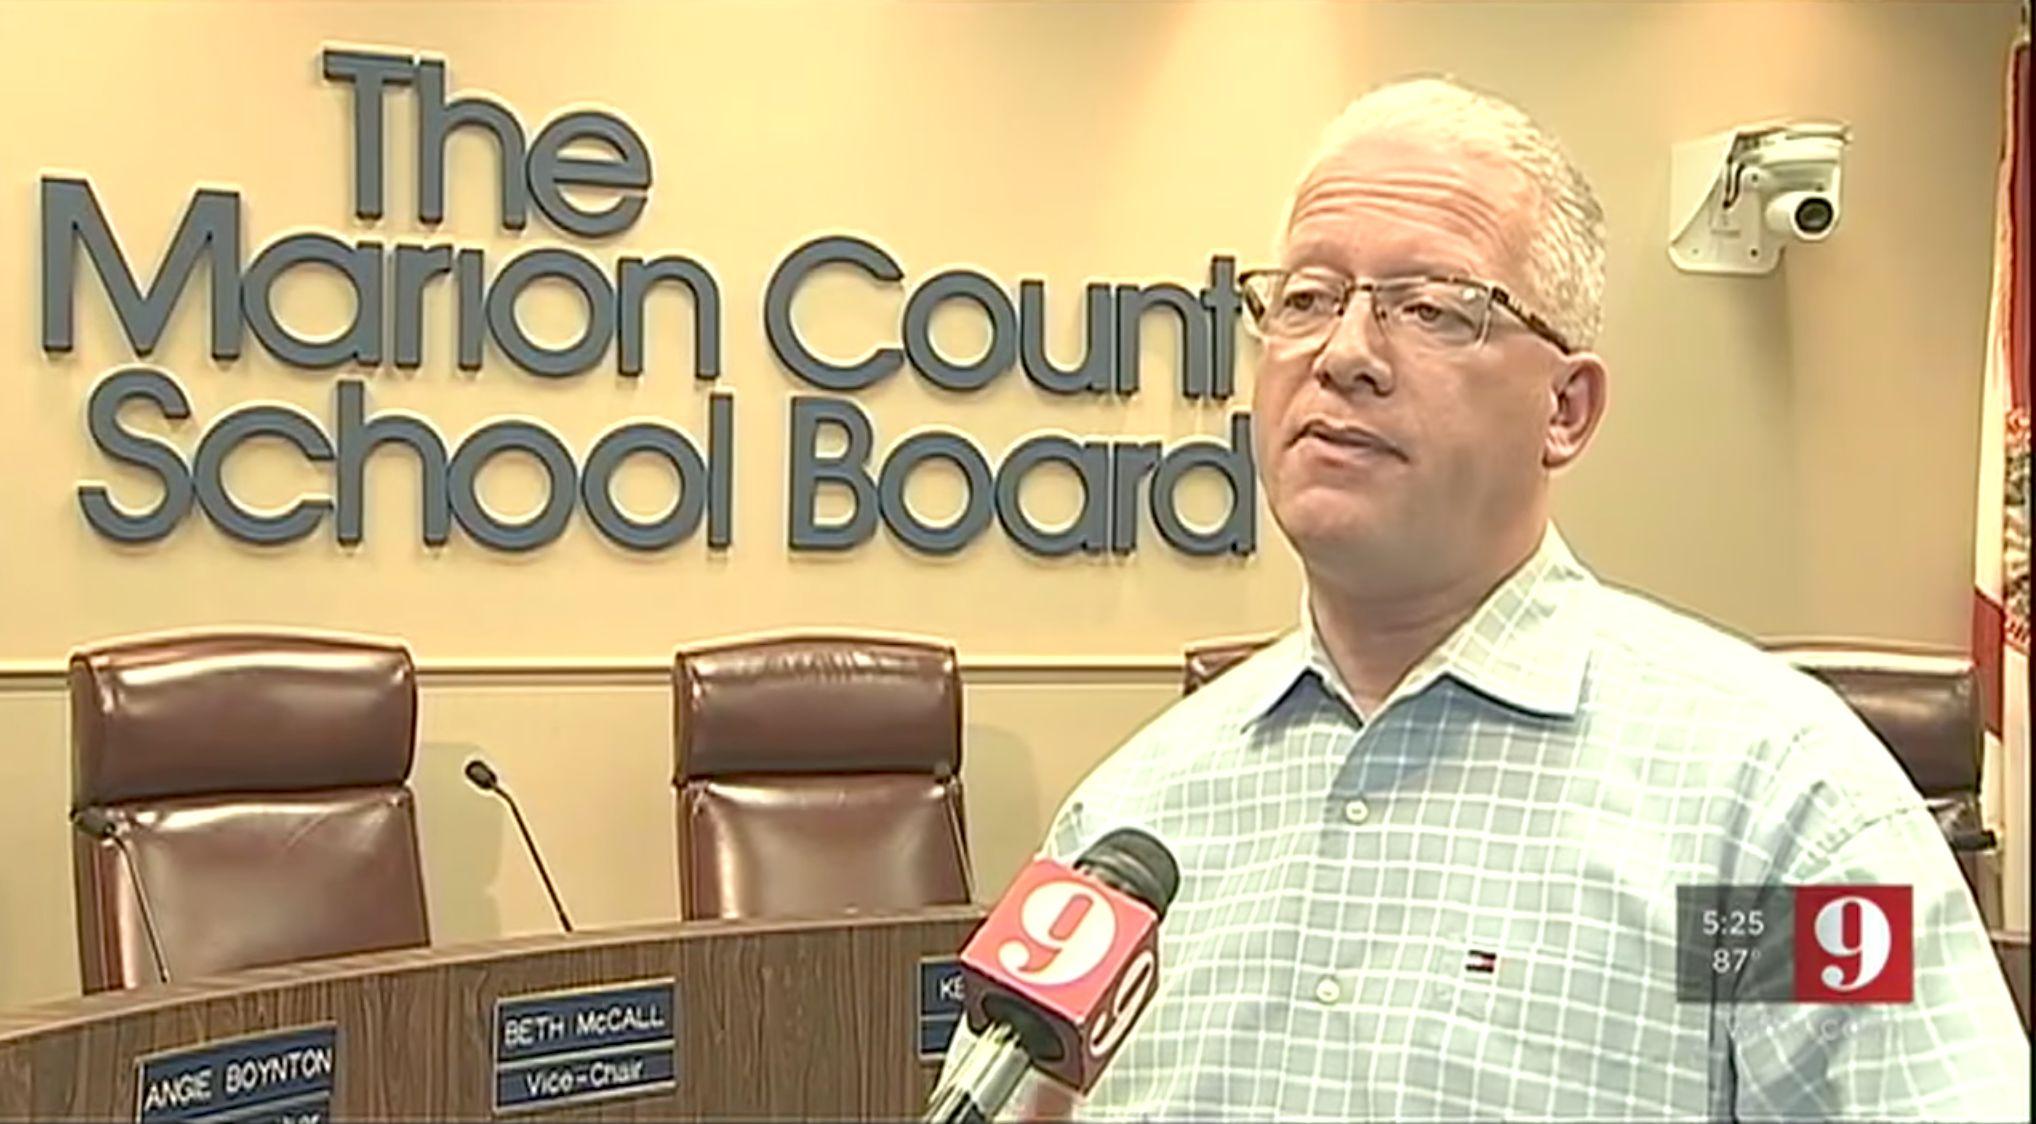 Florida School District Bans Homework, Says To Read Instead